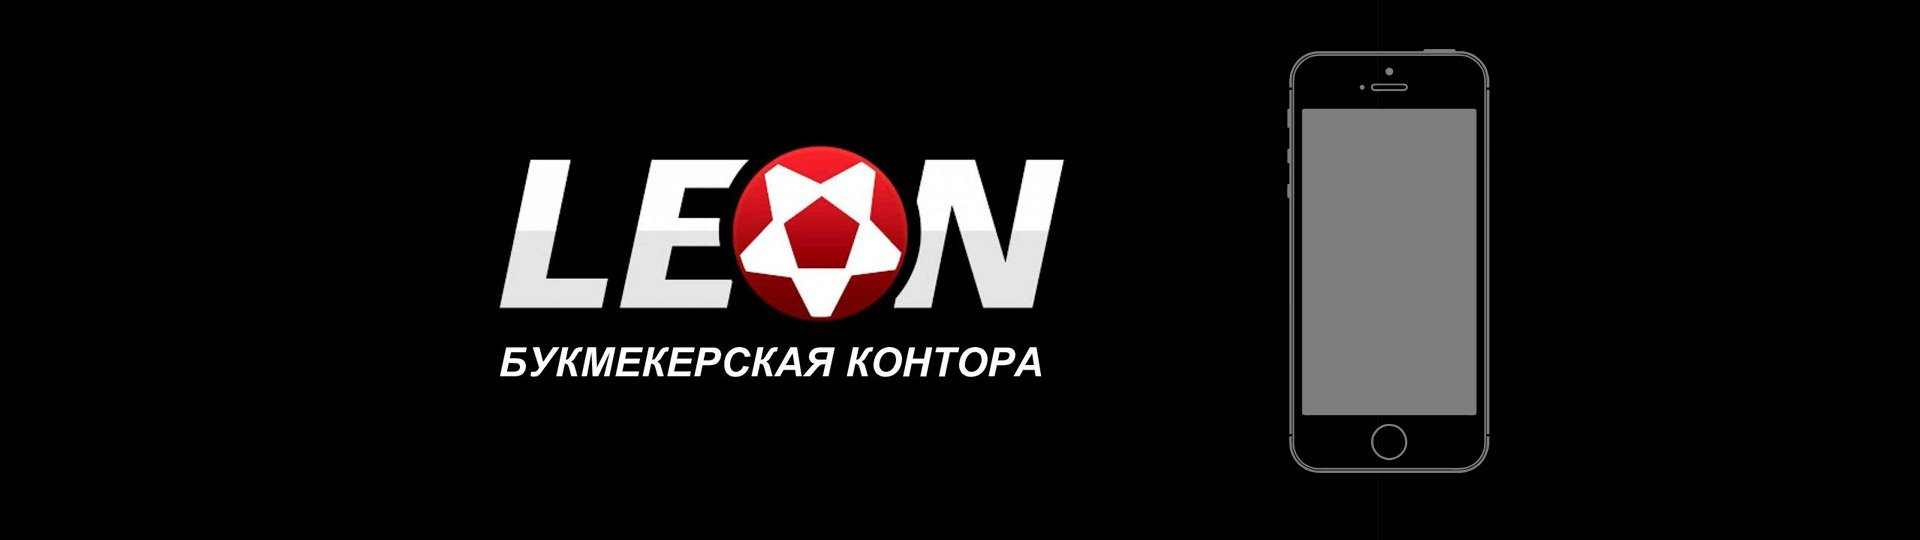 mobilnoe prilozhenie BK Leon